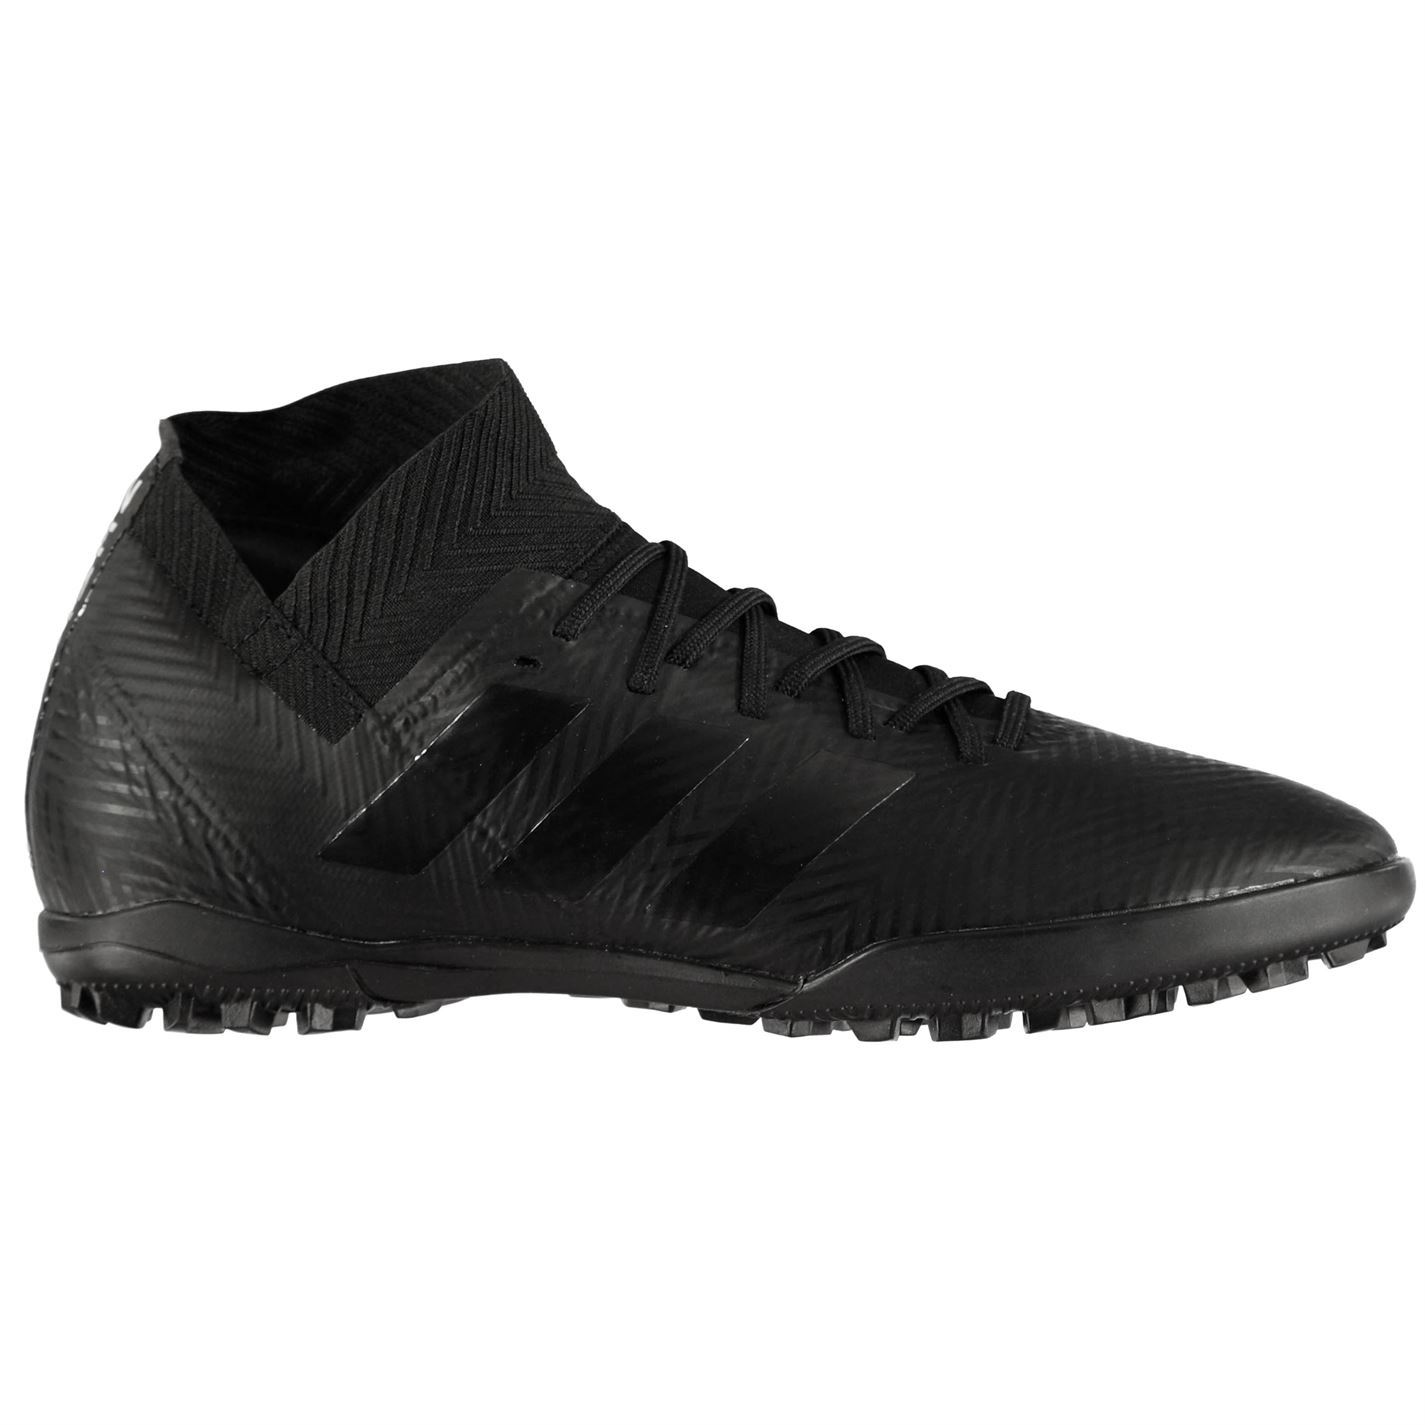 06c96ec994a0 ... adidas Nemeziz Tango 18.3 Astro Turf Football Trainers Mens Black  Soccer Shoes ...